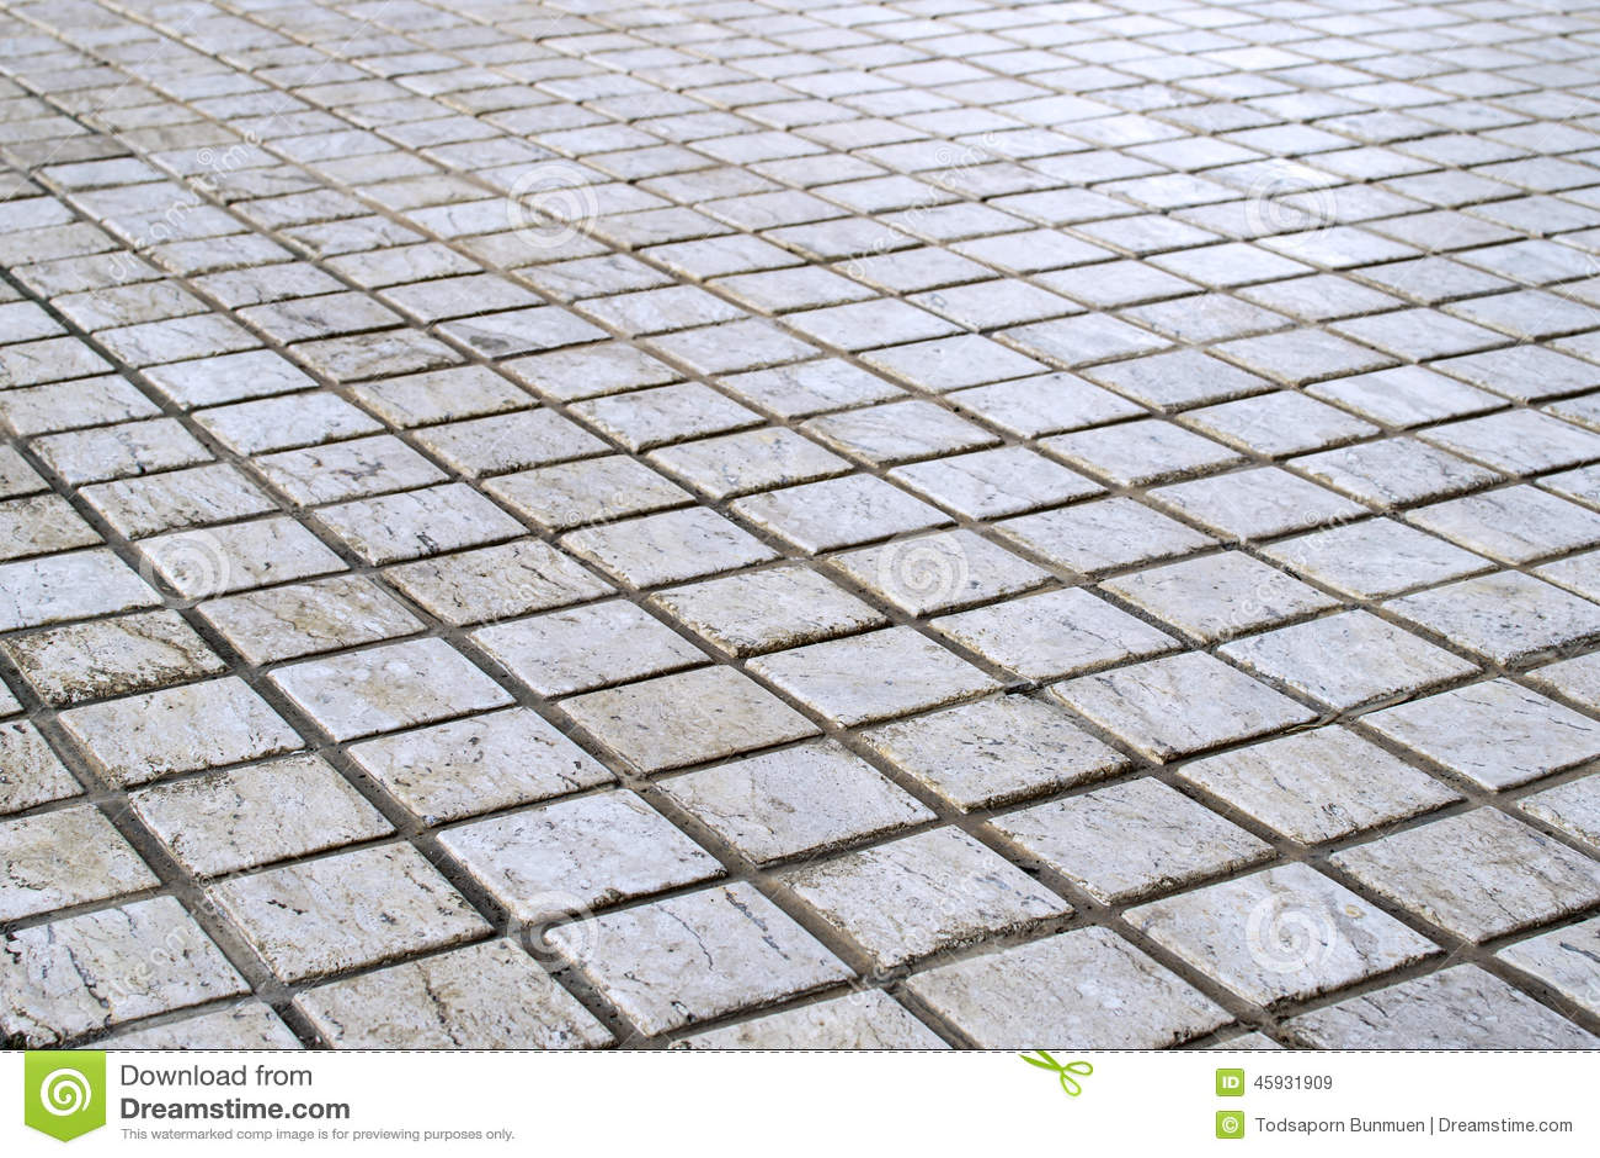 Patterned Paving Tiles Cement Brick Floor Background